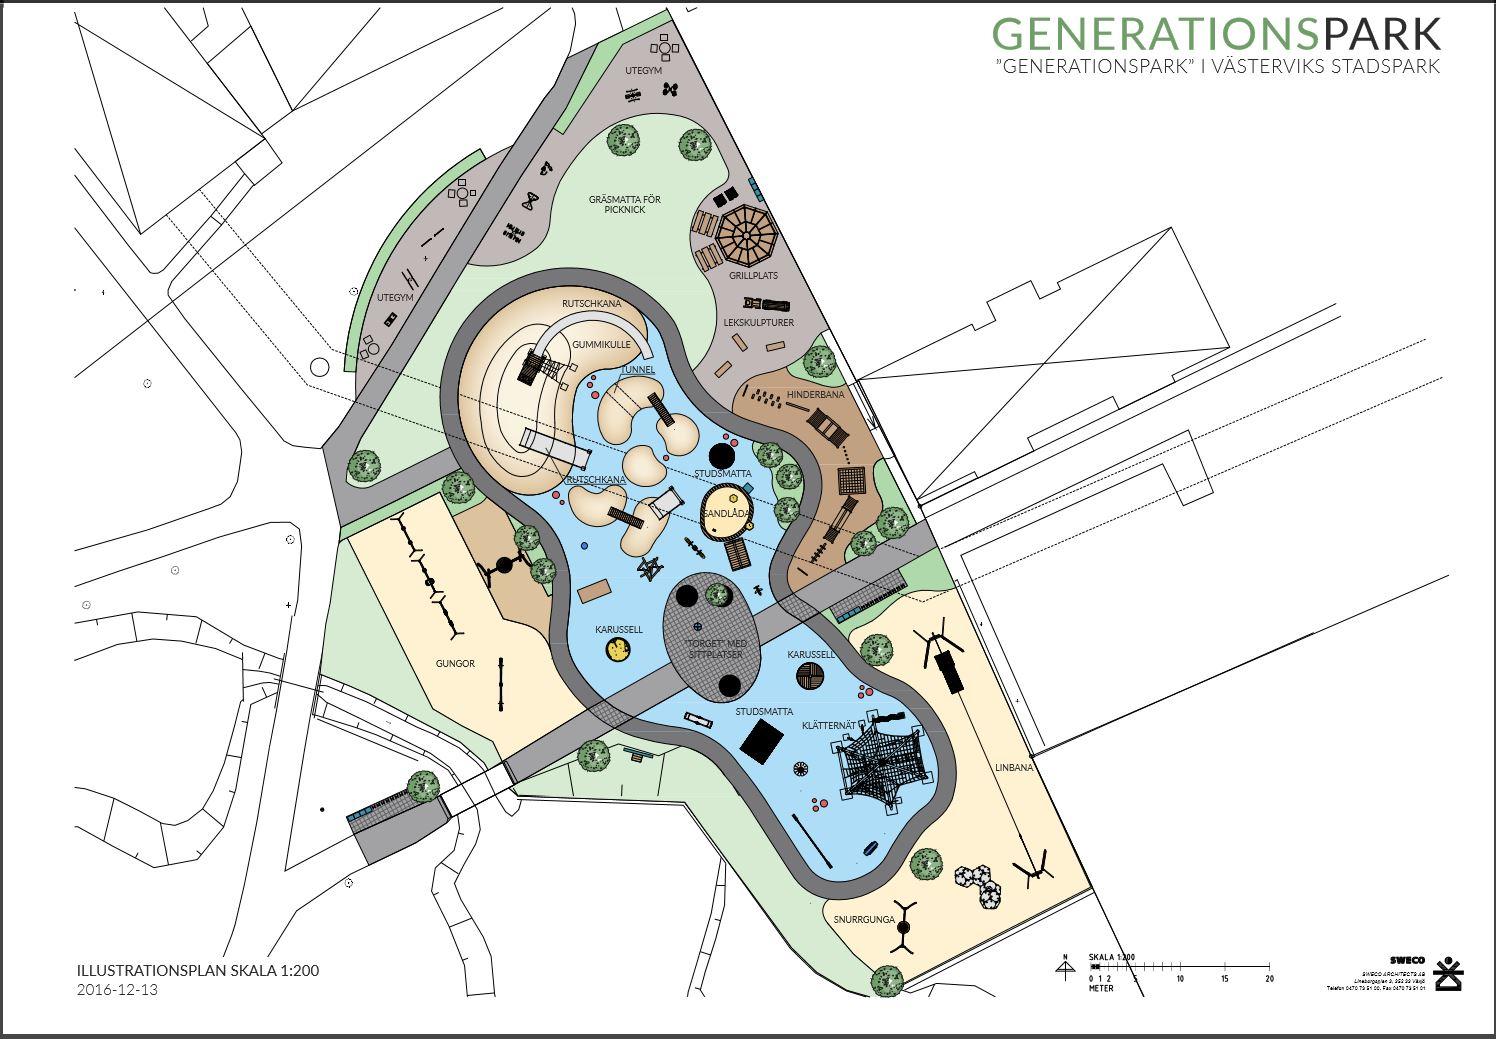 Stadsparkens generationspark